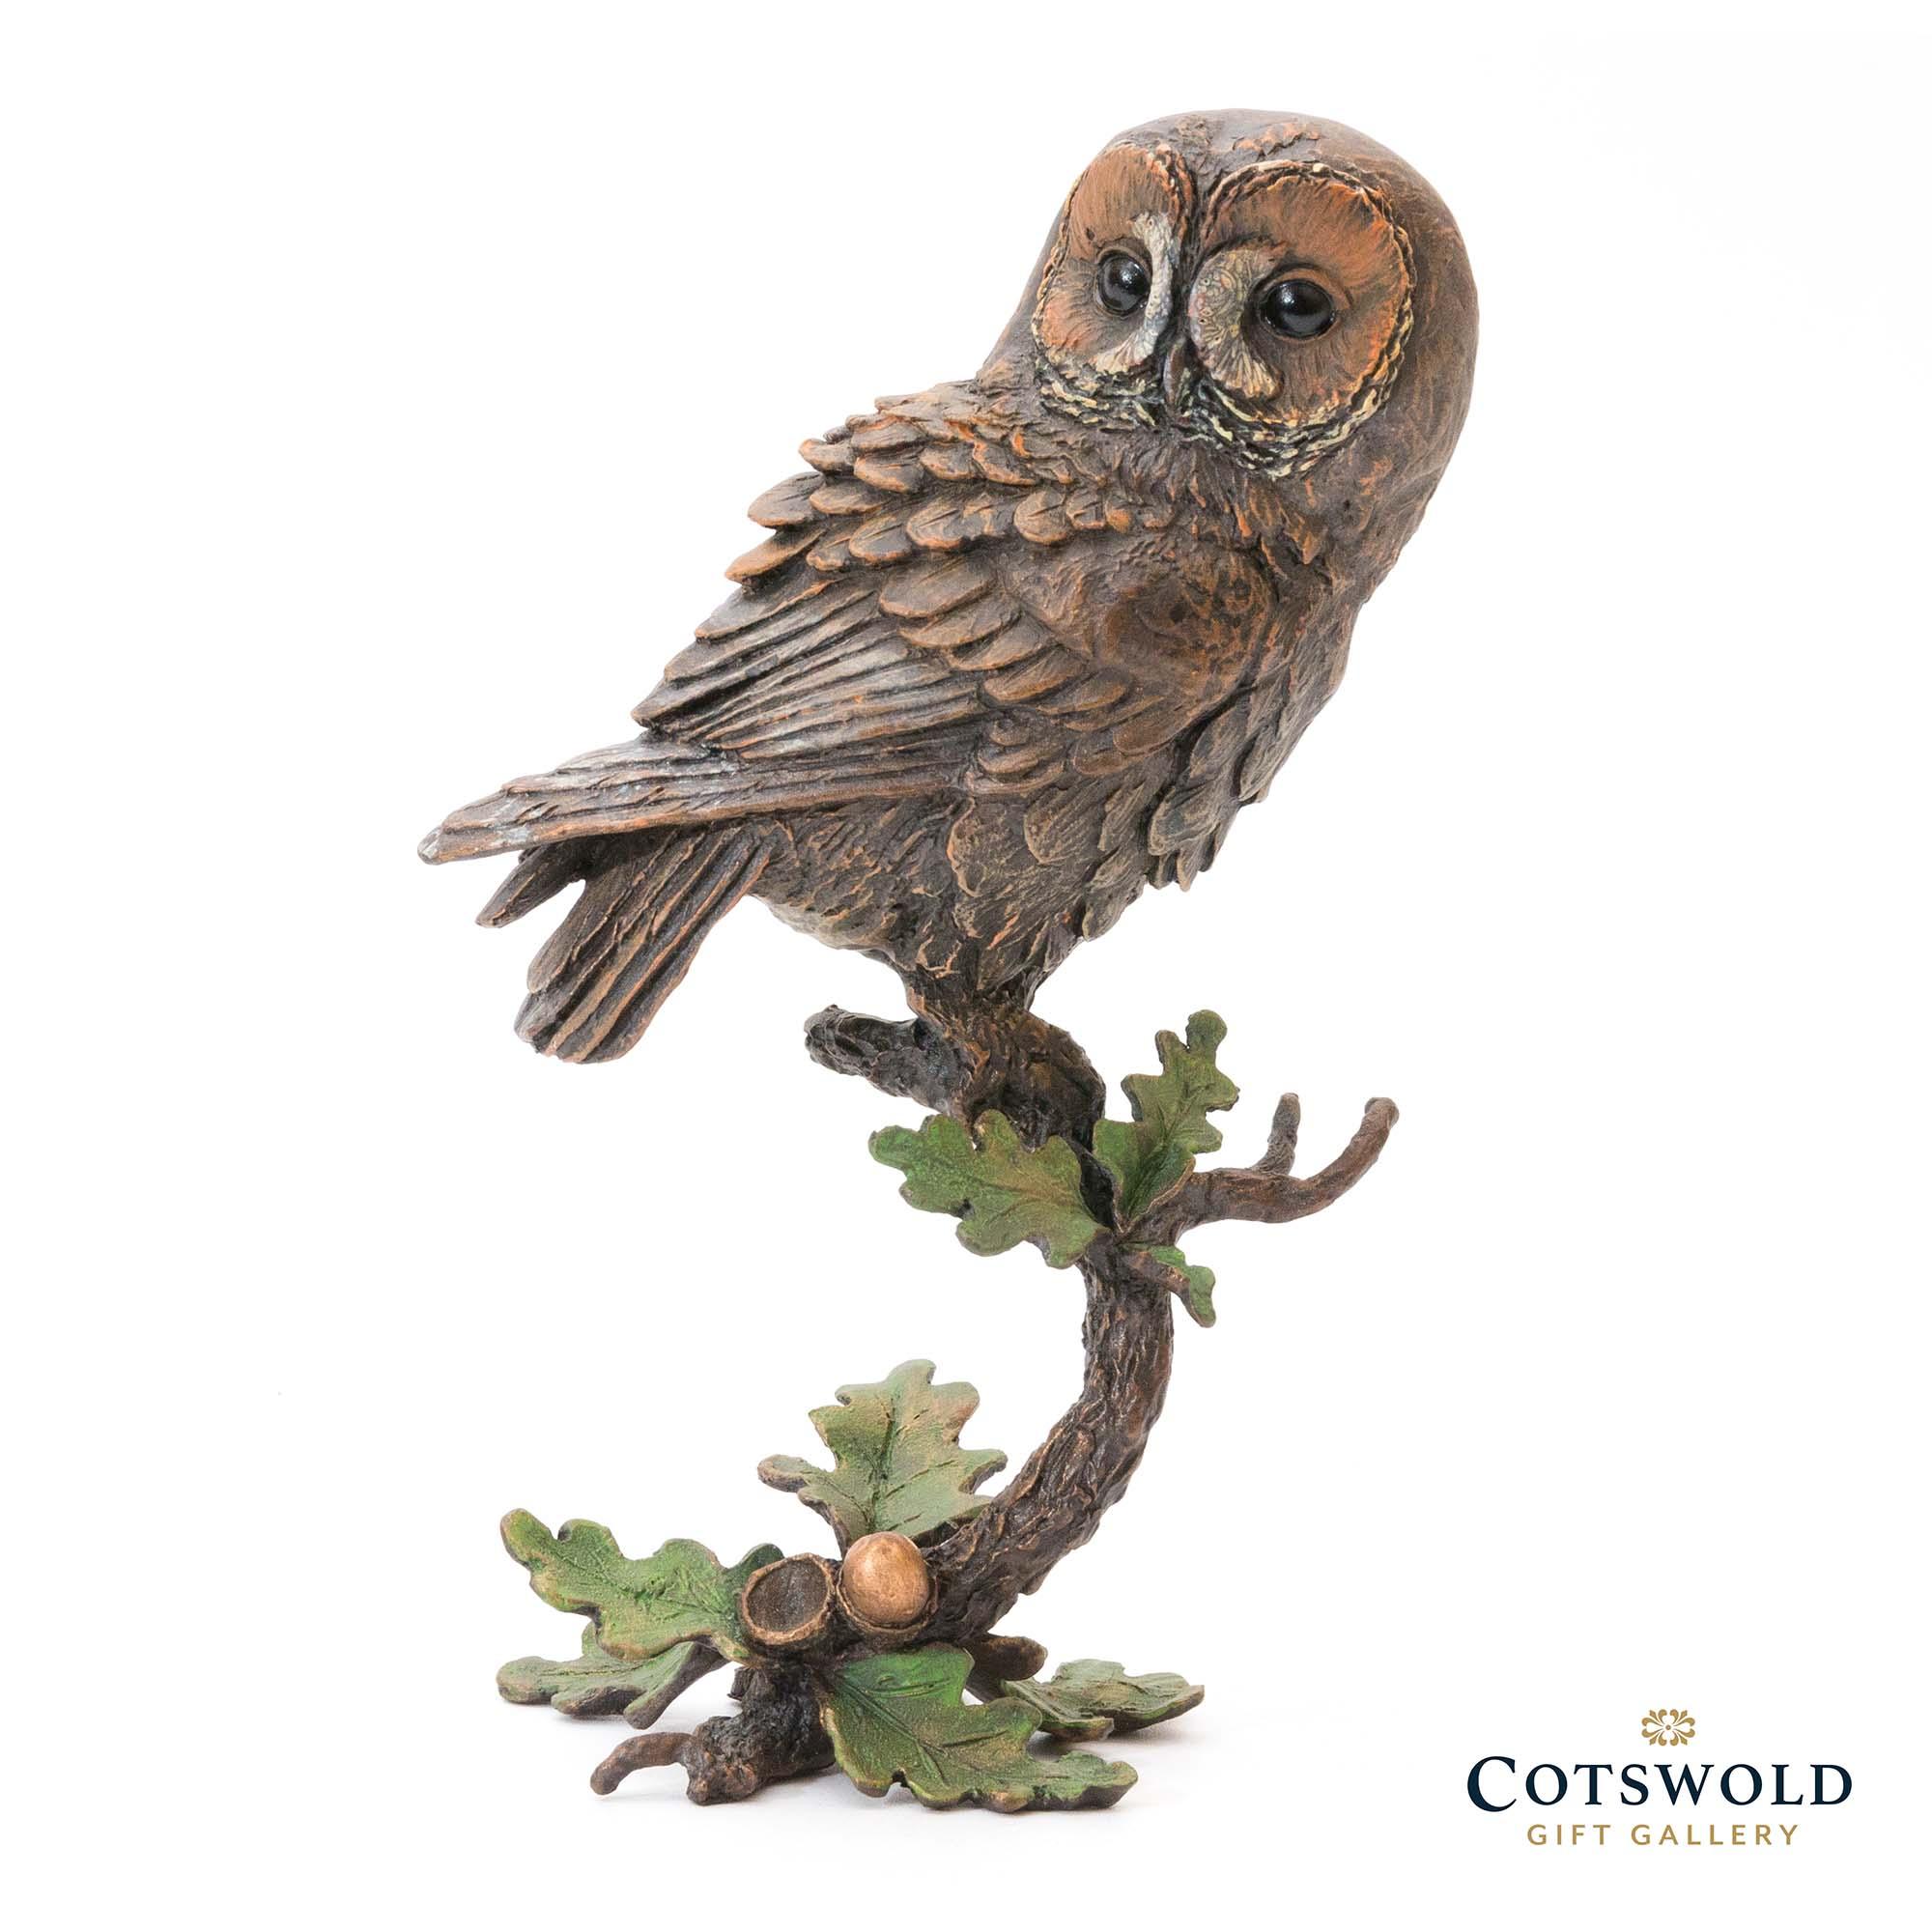 Michael Simpson Tawny Owl With Acorns